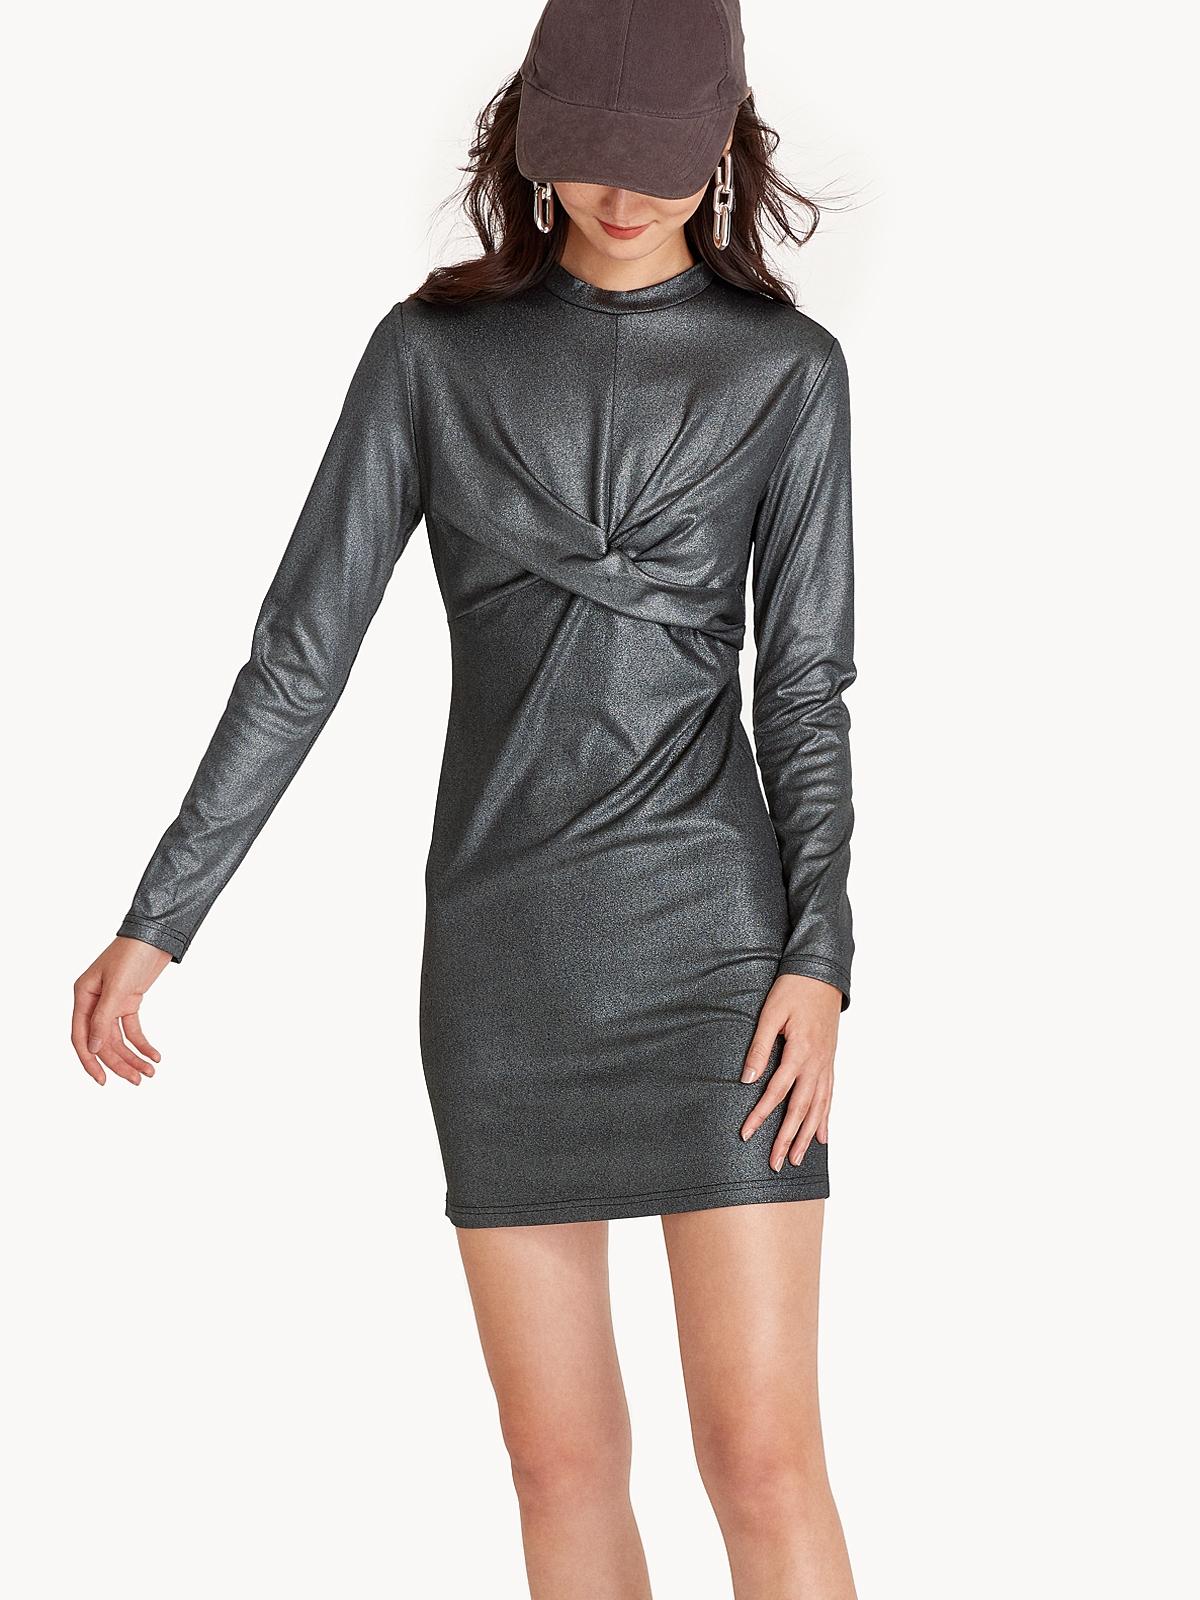 Damaris Metallic Bodycon Dress